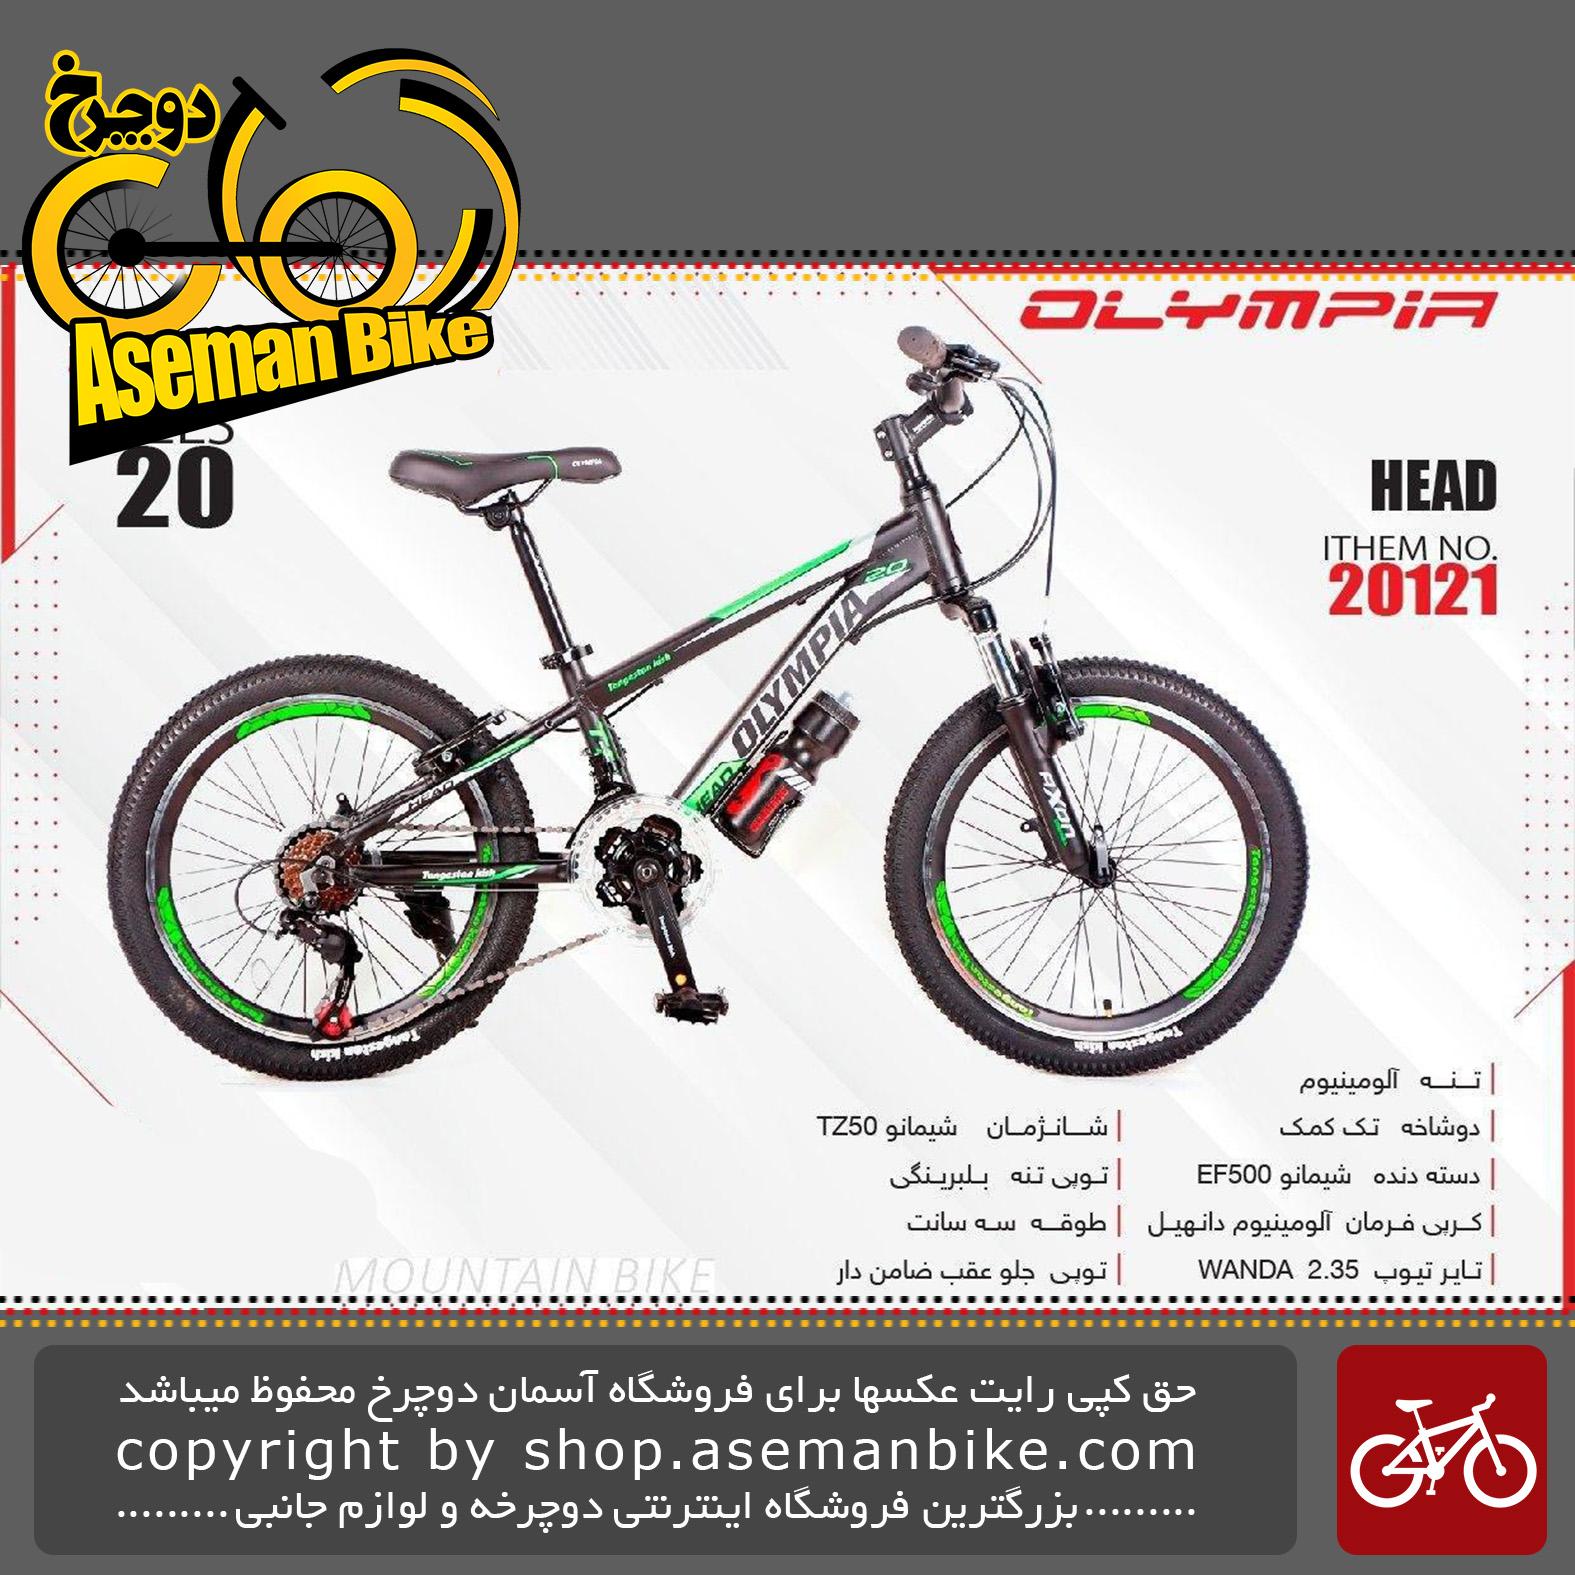 دوچرخه کوهستان شهری المپیا سایز ۲۰ مدل هد OLYMPIA Bicycle Size 20 Model HEAD